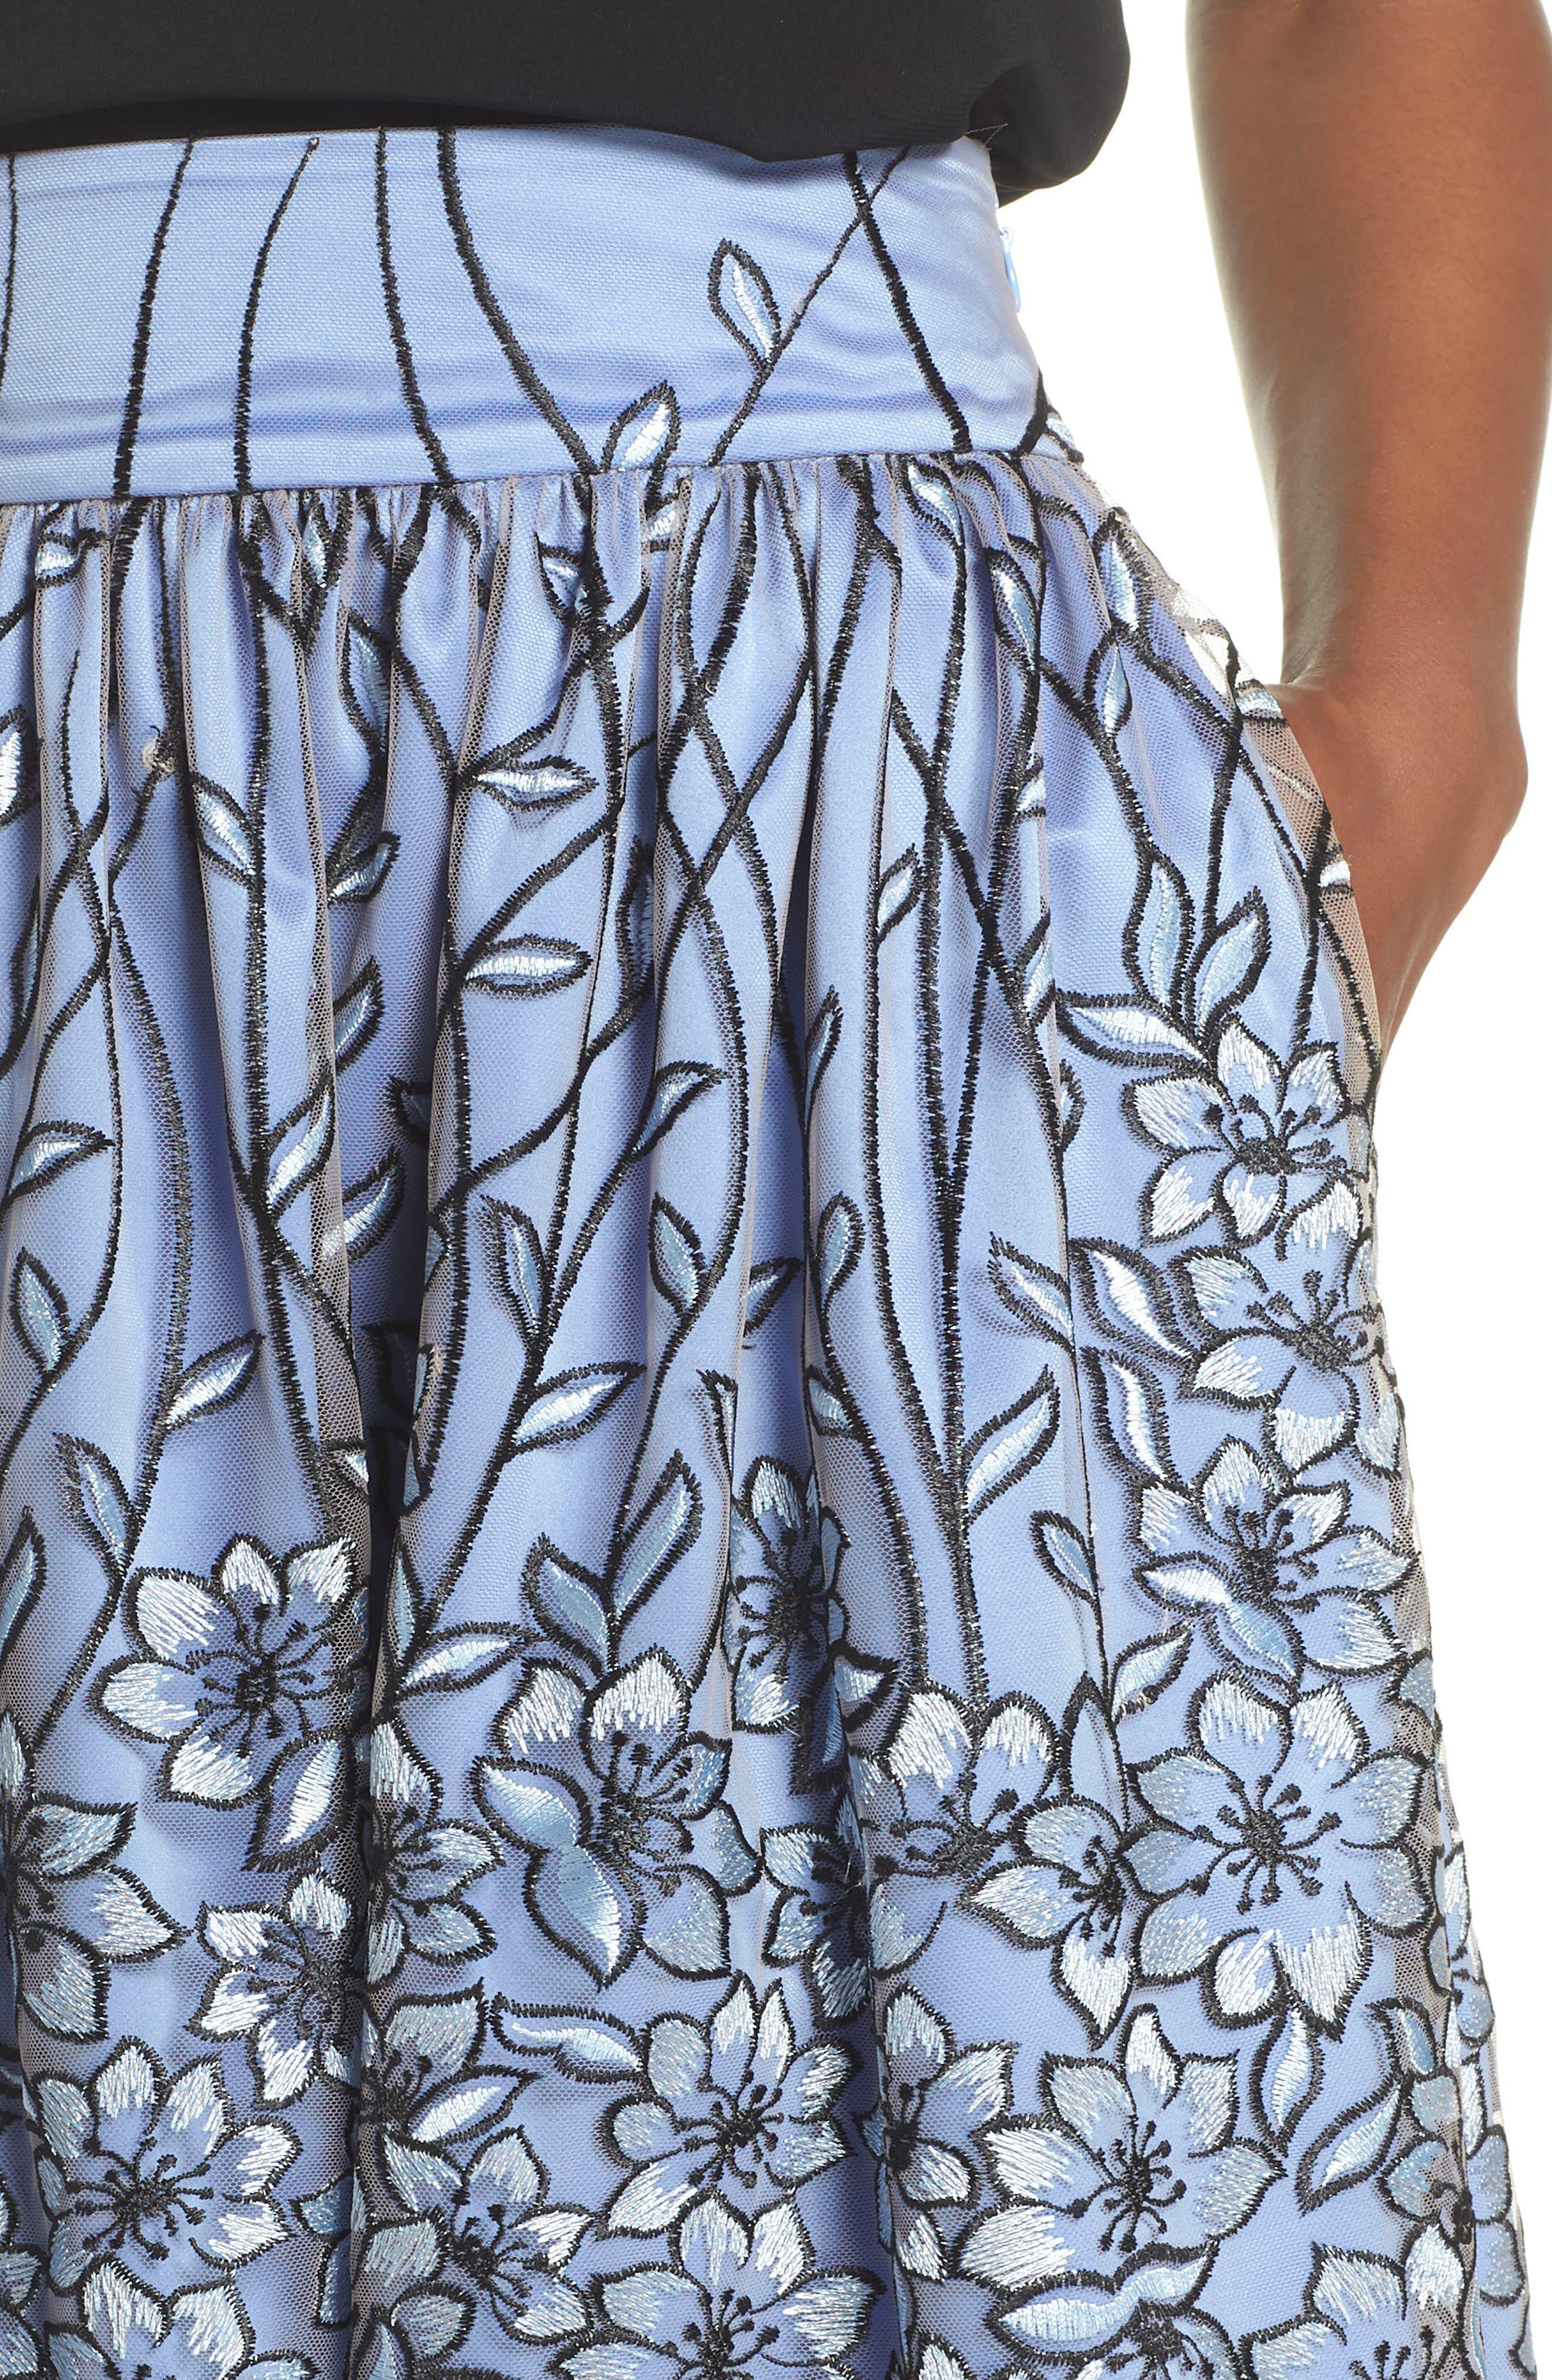 Embroidered A-Line SKirt,                             Alternate thumbnail 4, color,                             Blue Black